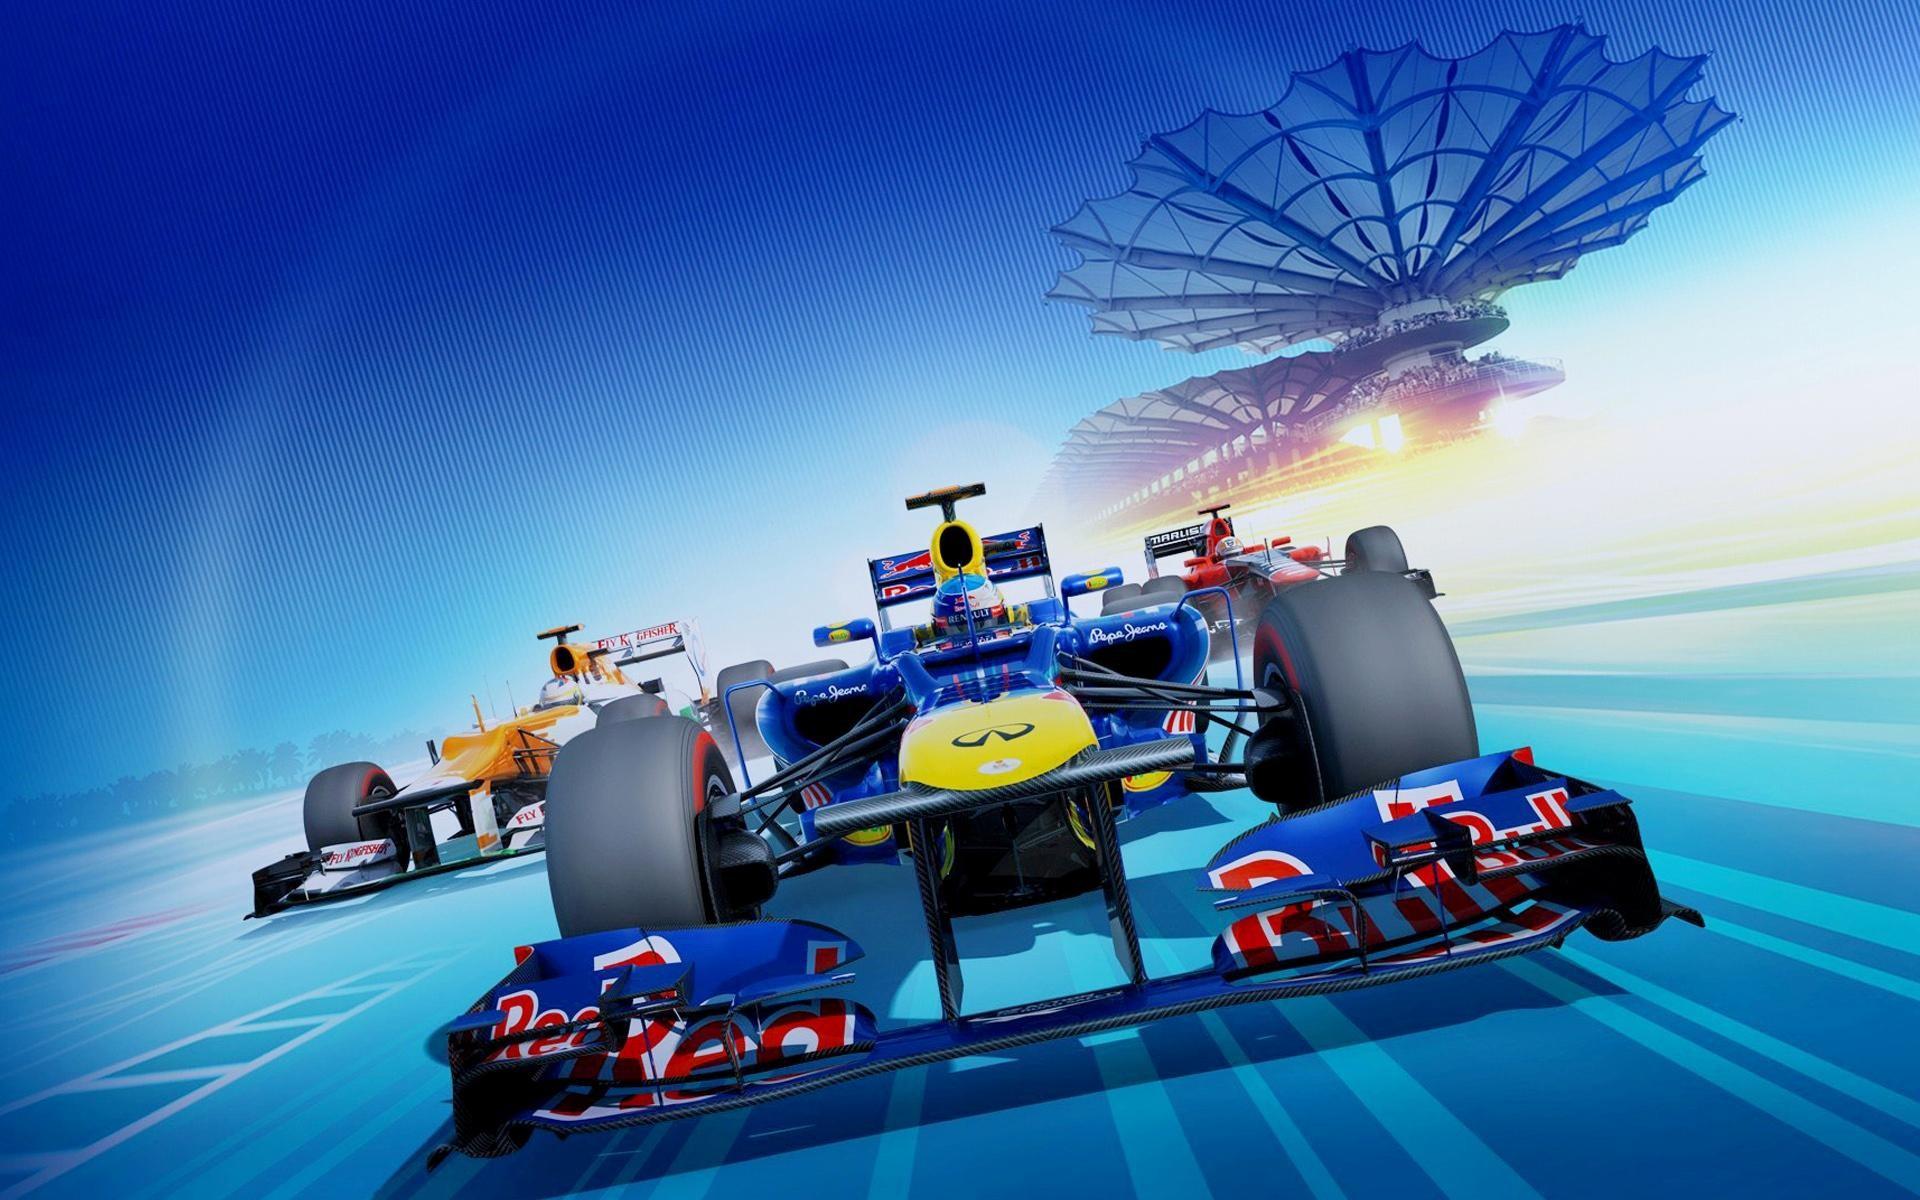 wallpaper.wiki-Formula-1-Red-Bull-PIC-WPC003886